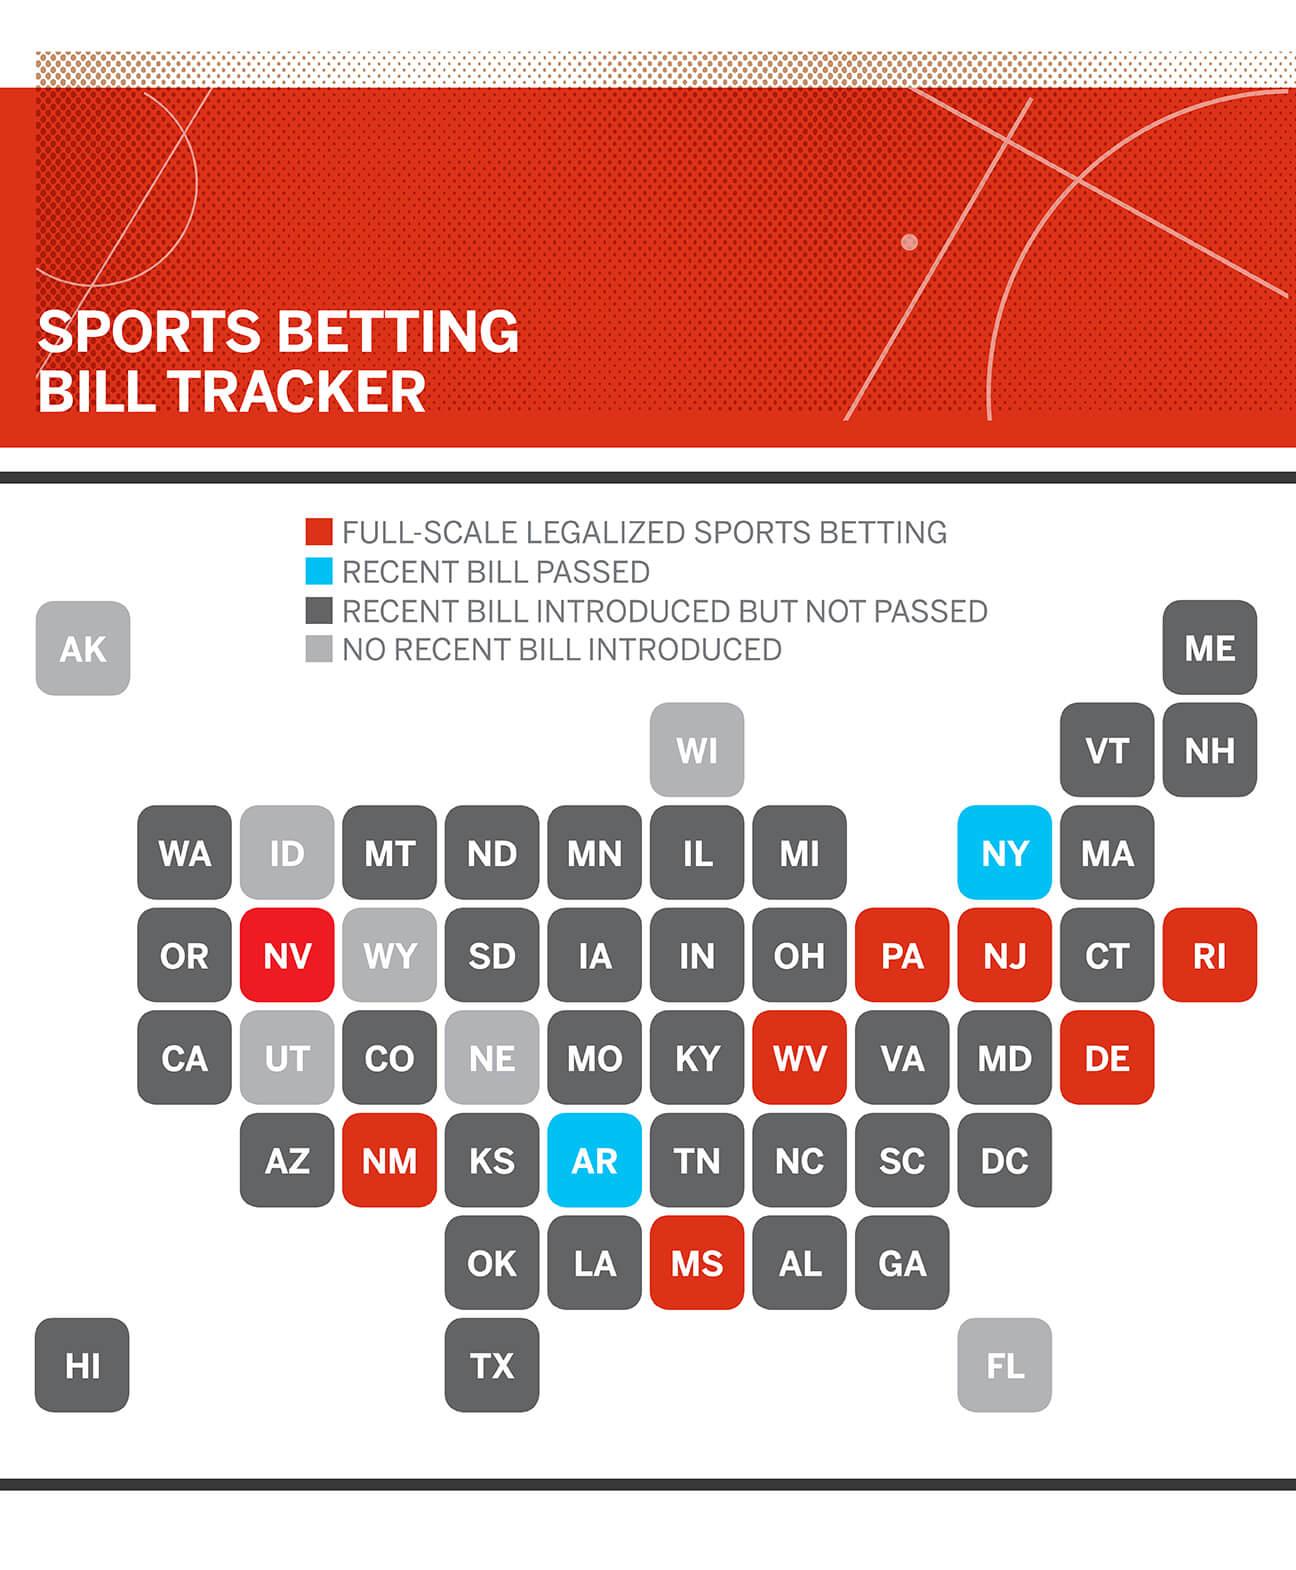 California pols okay amended online casino, sports betting legislation SBBgraphic1